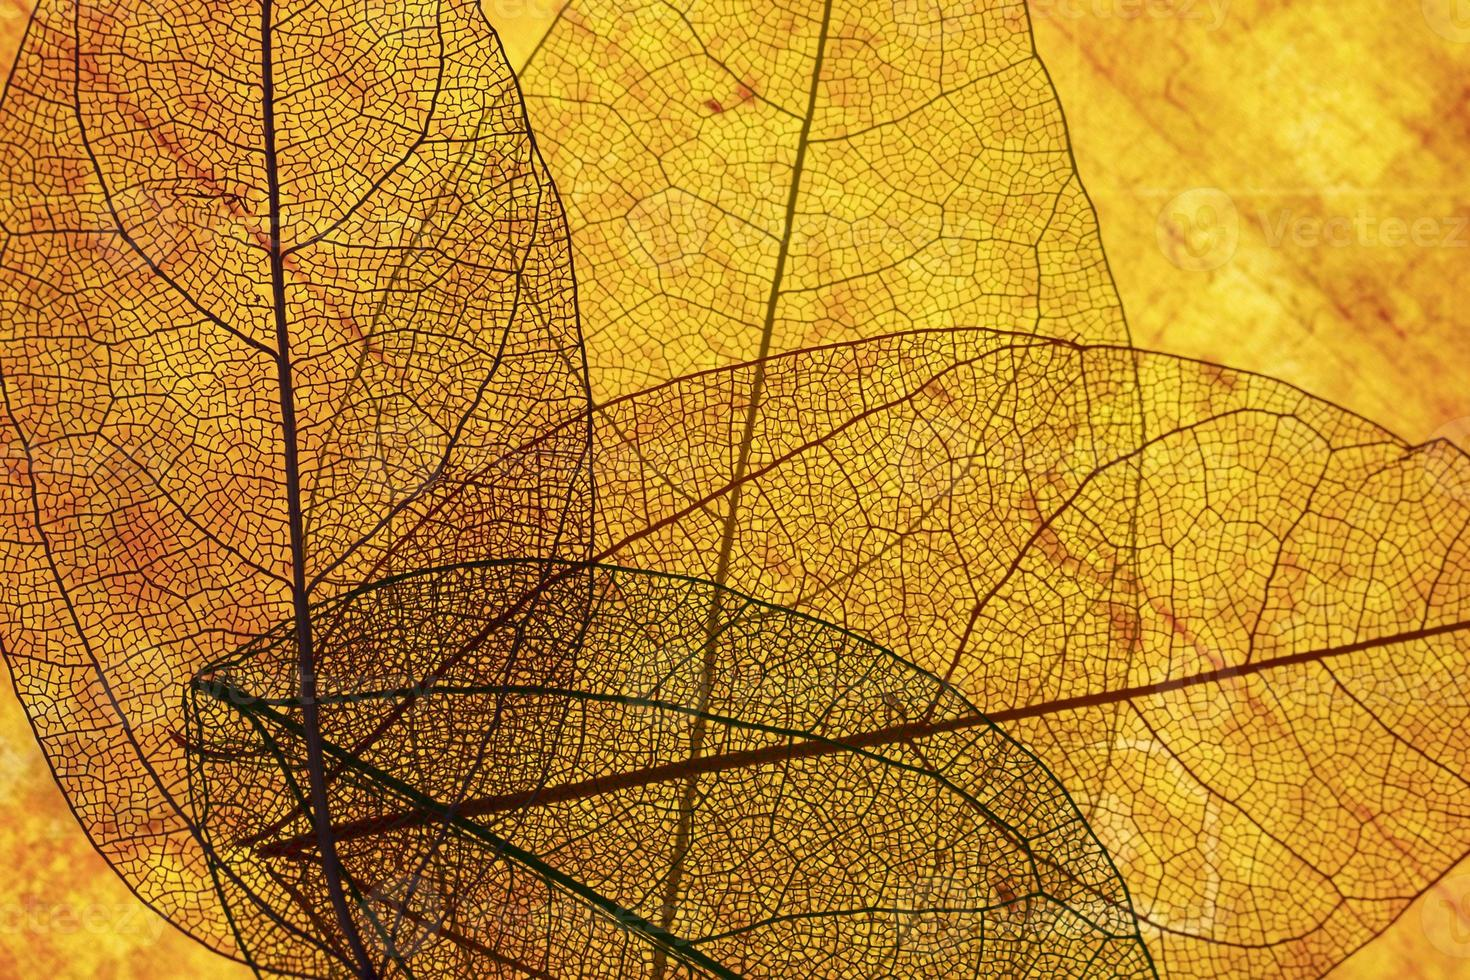 framifrån orange transparent blad foto